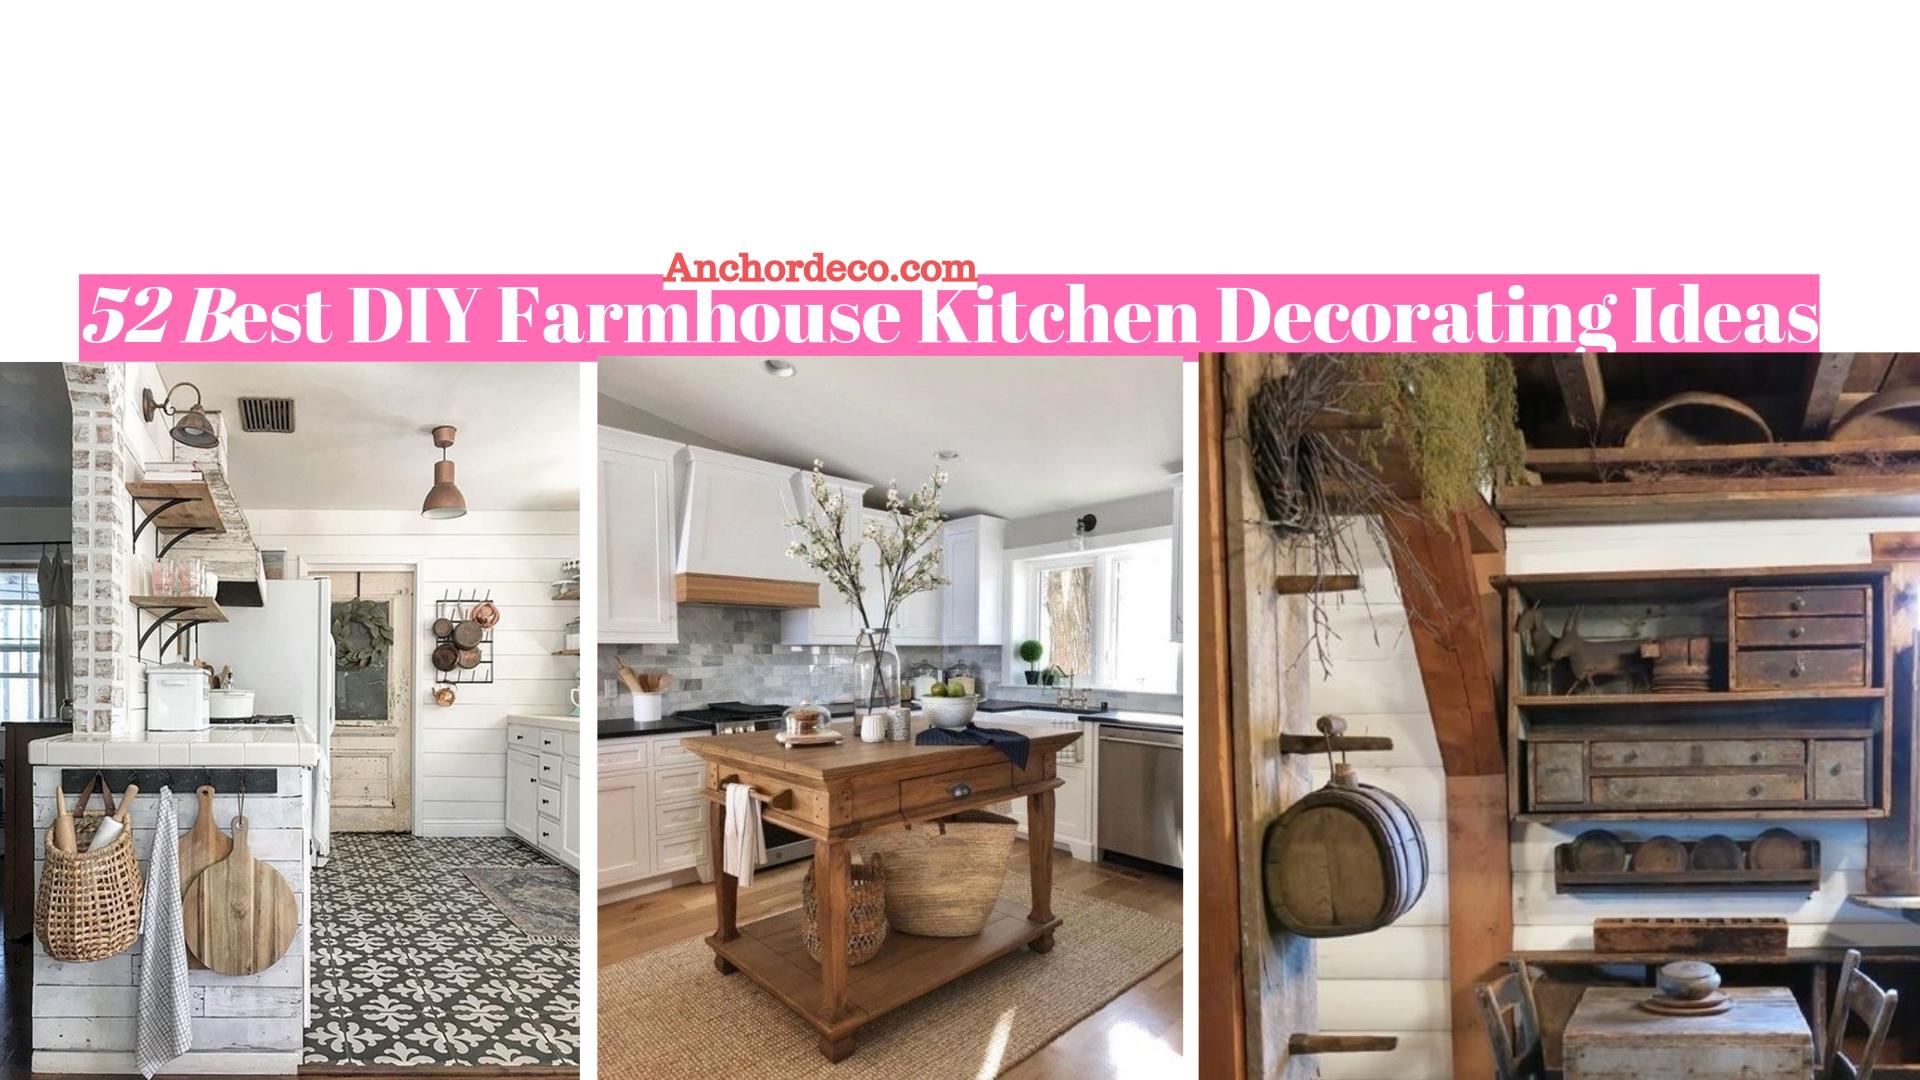 52 Best DIY Farmhouse Kitchen Decorating Ideas - anchordeco.com